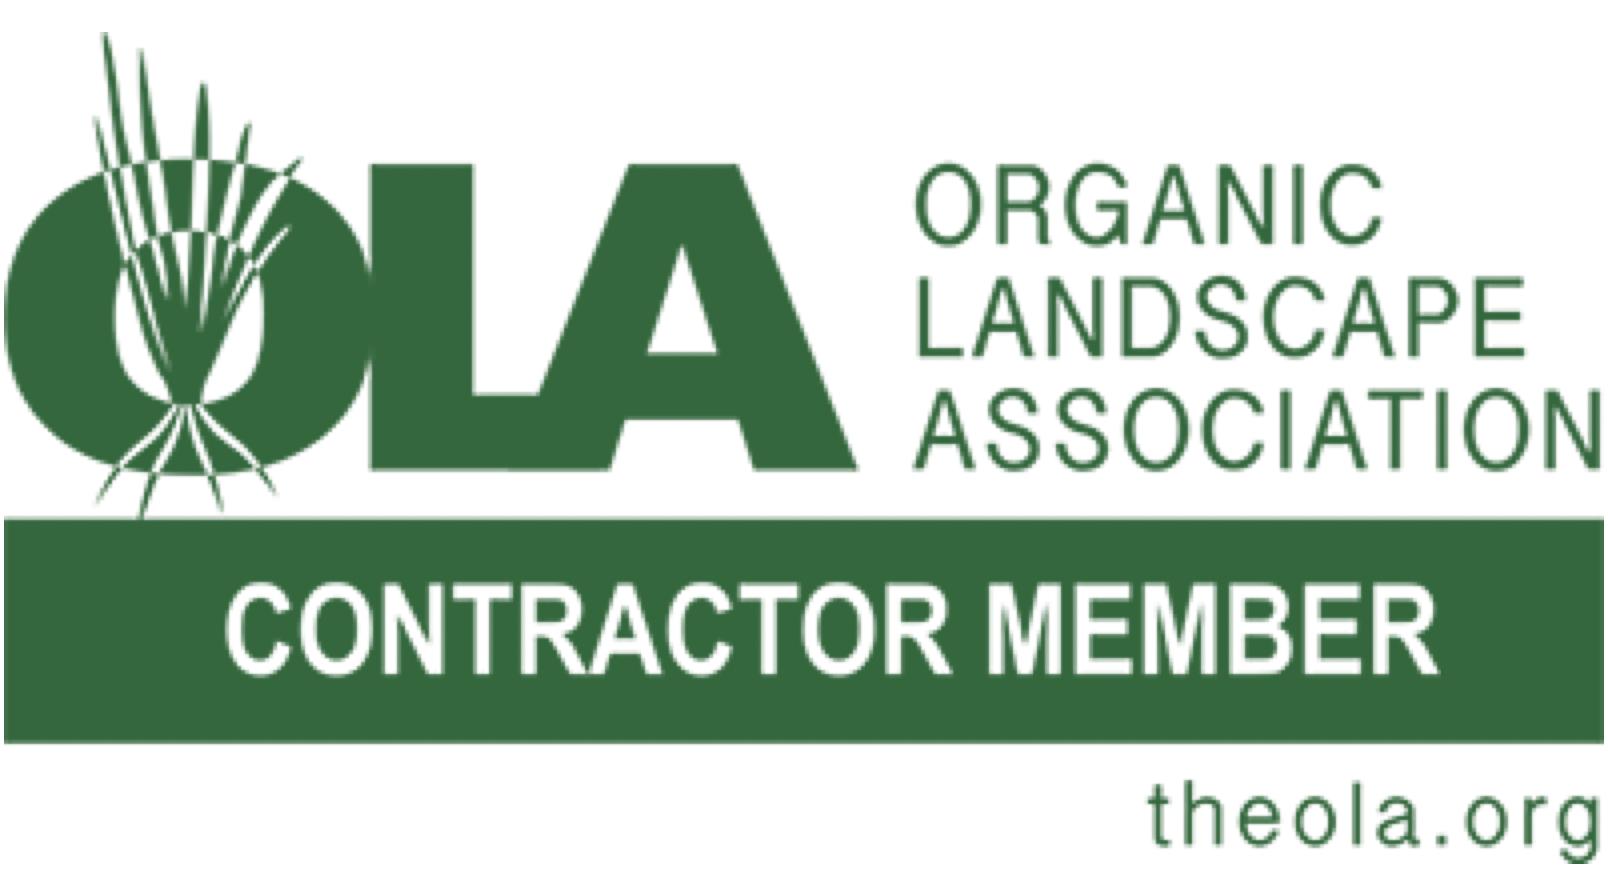 Organic Landscape Association Member